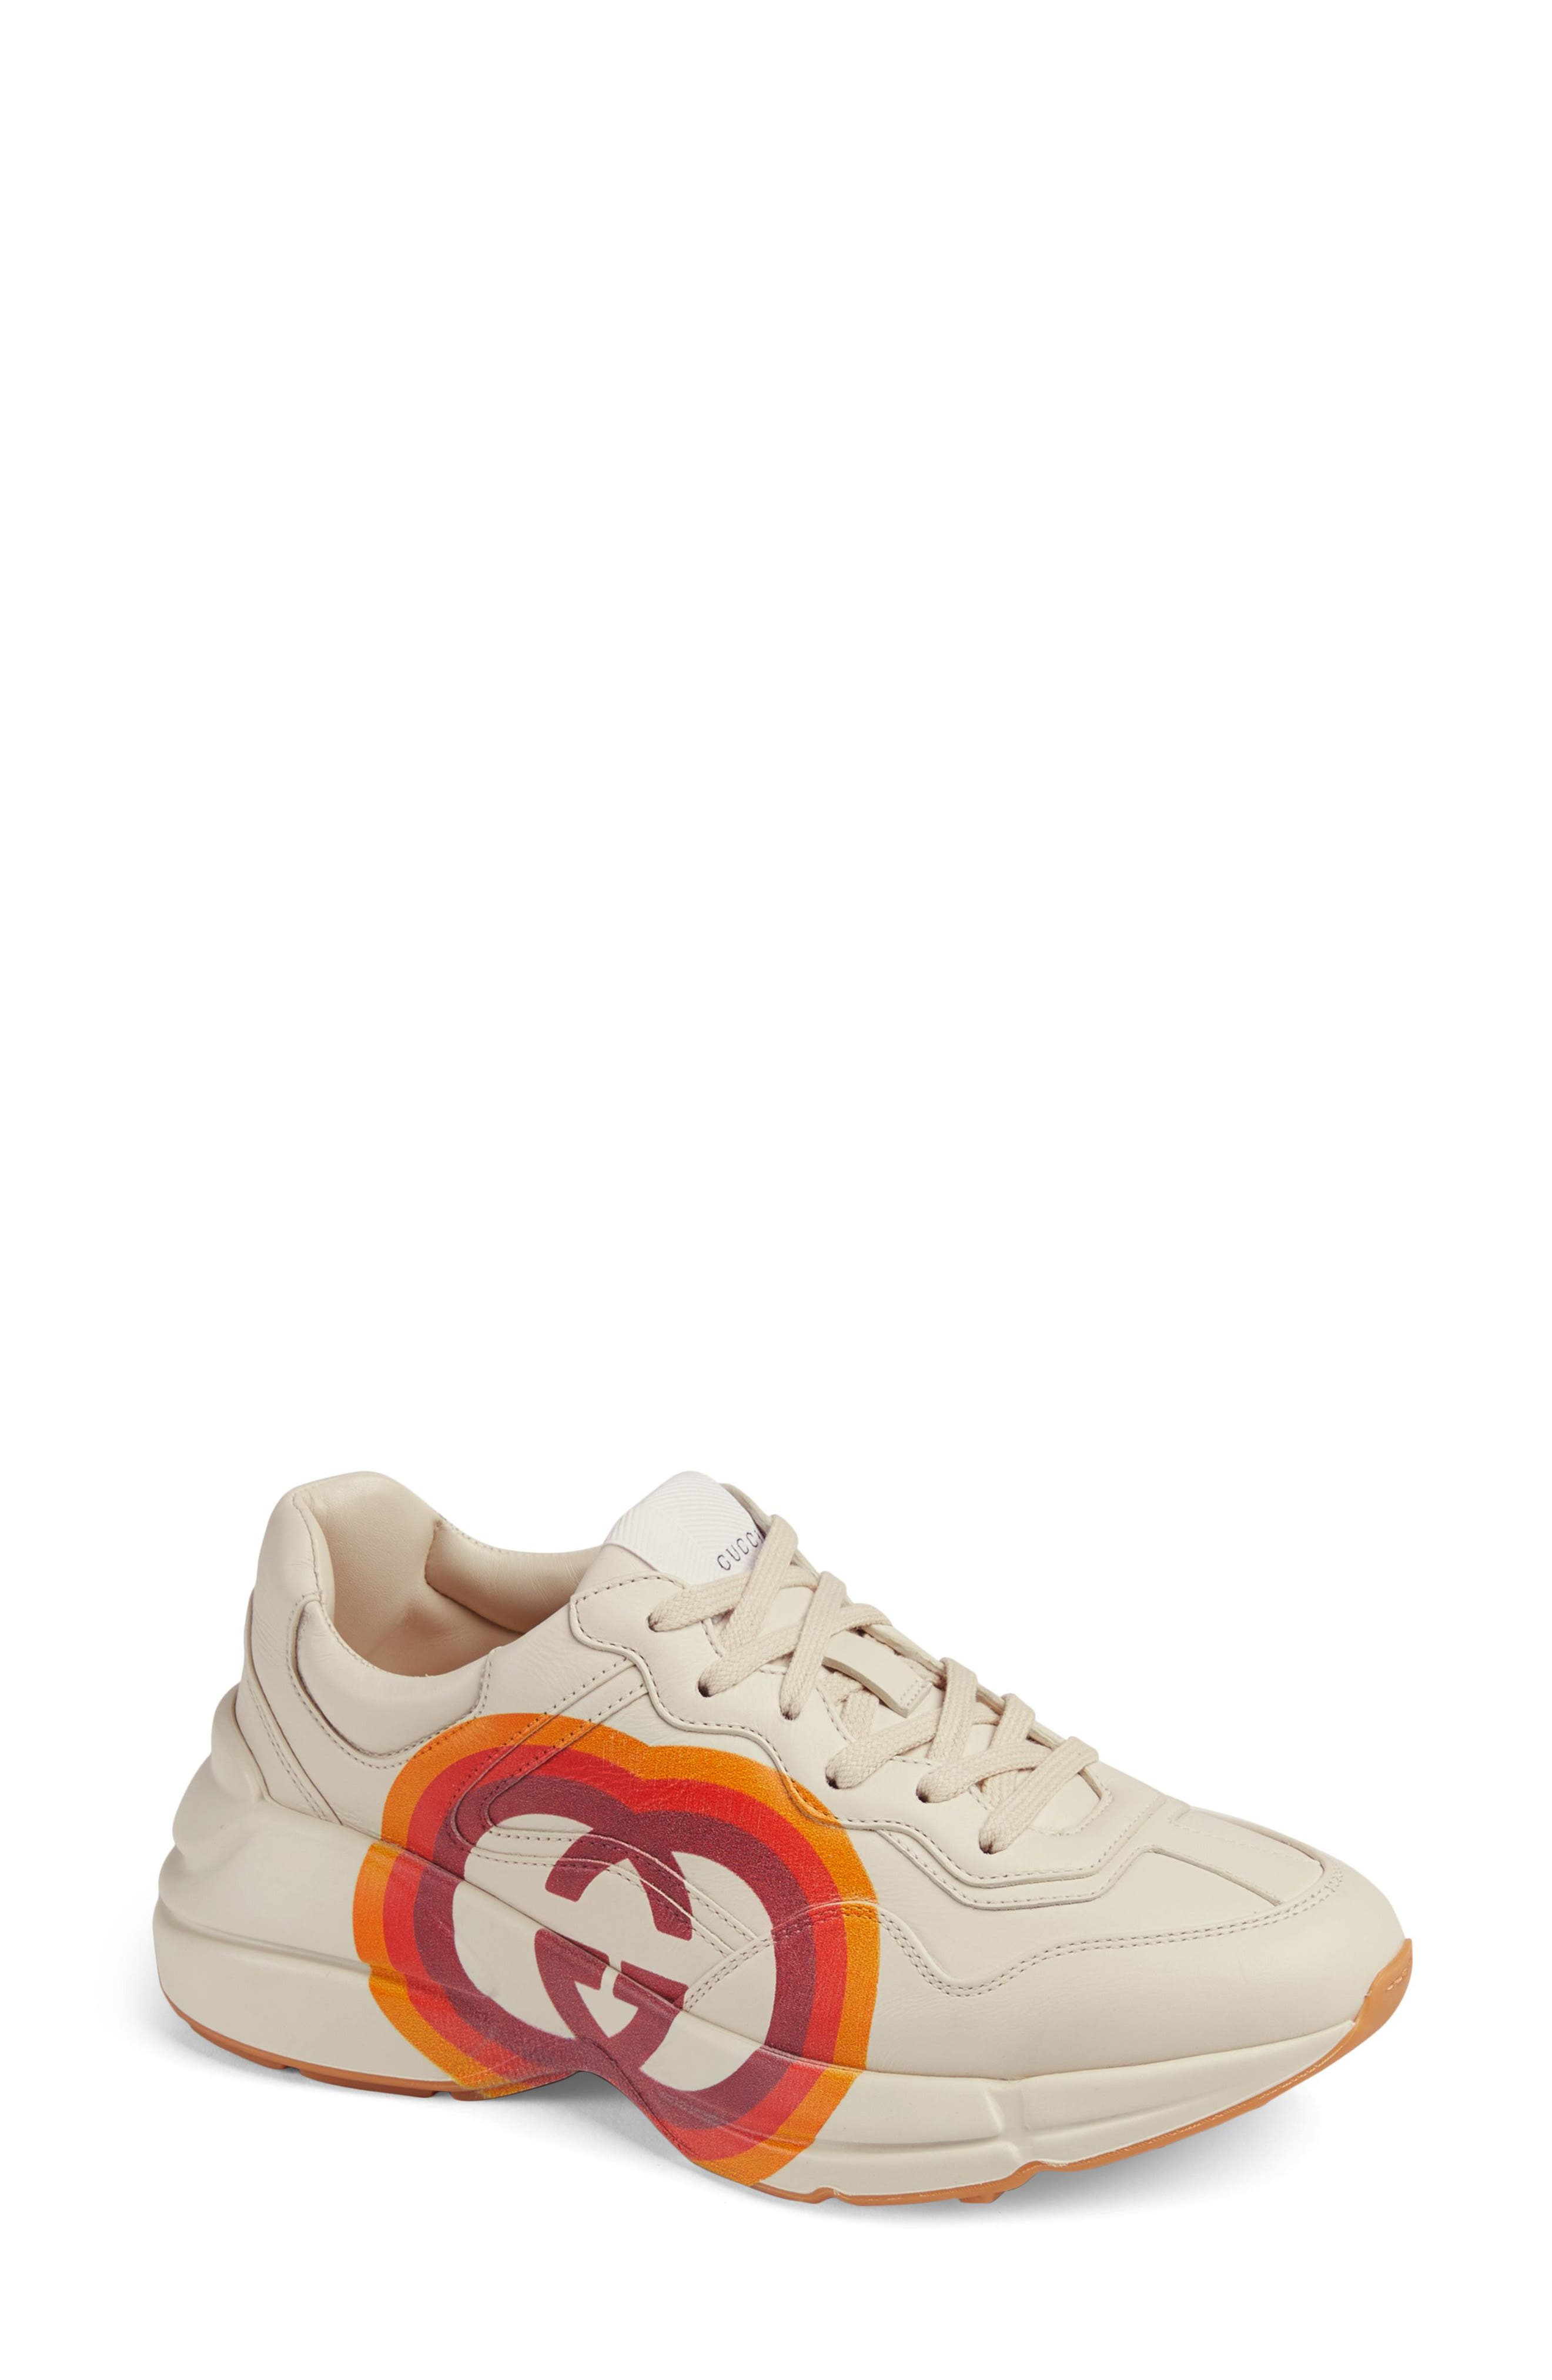 Rhyton Double G Sneaker,                             Main thumbnail 1, color,                             MYSTIC WHITE